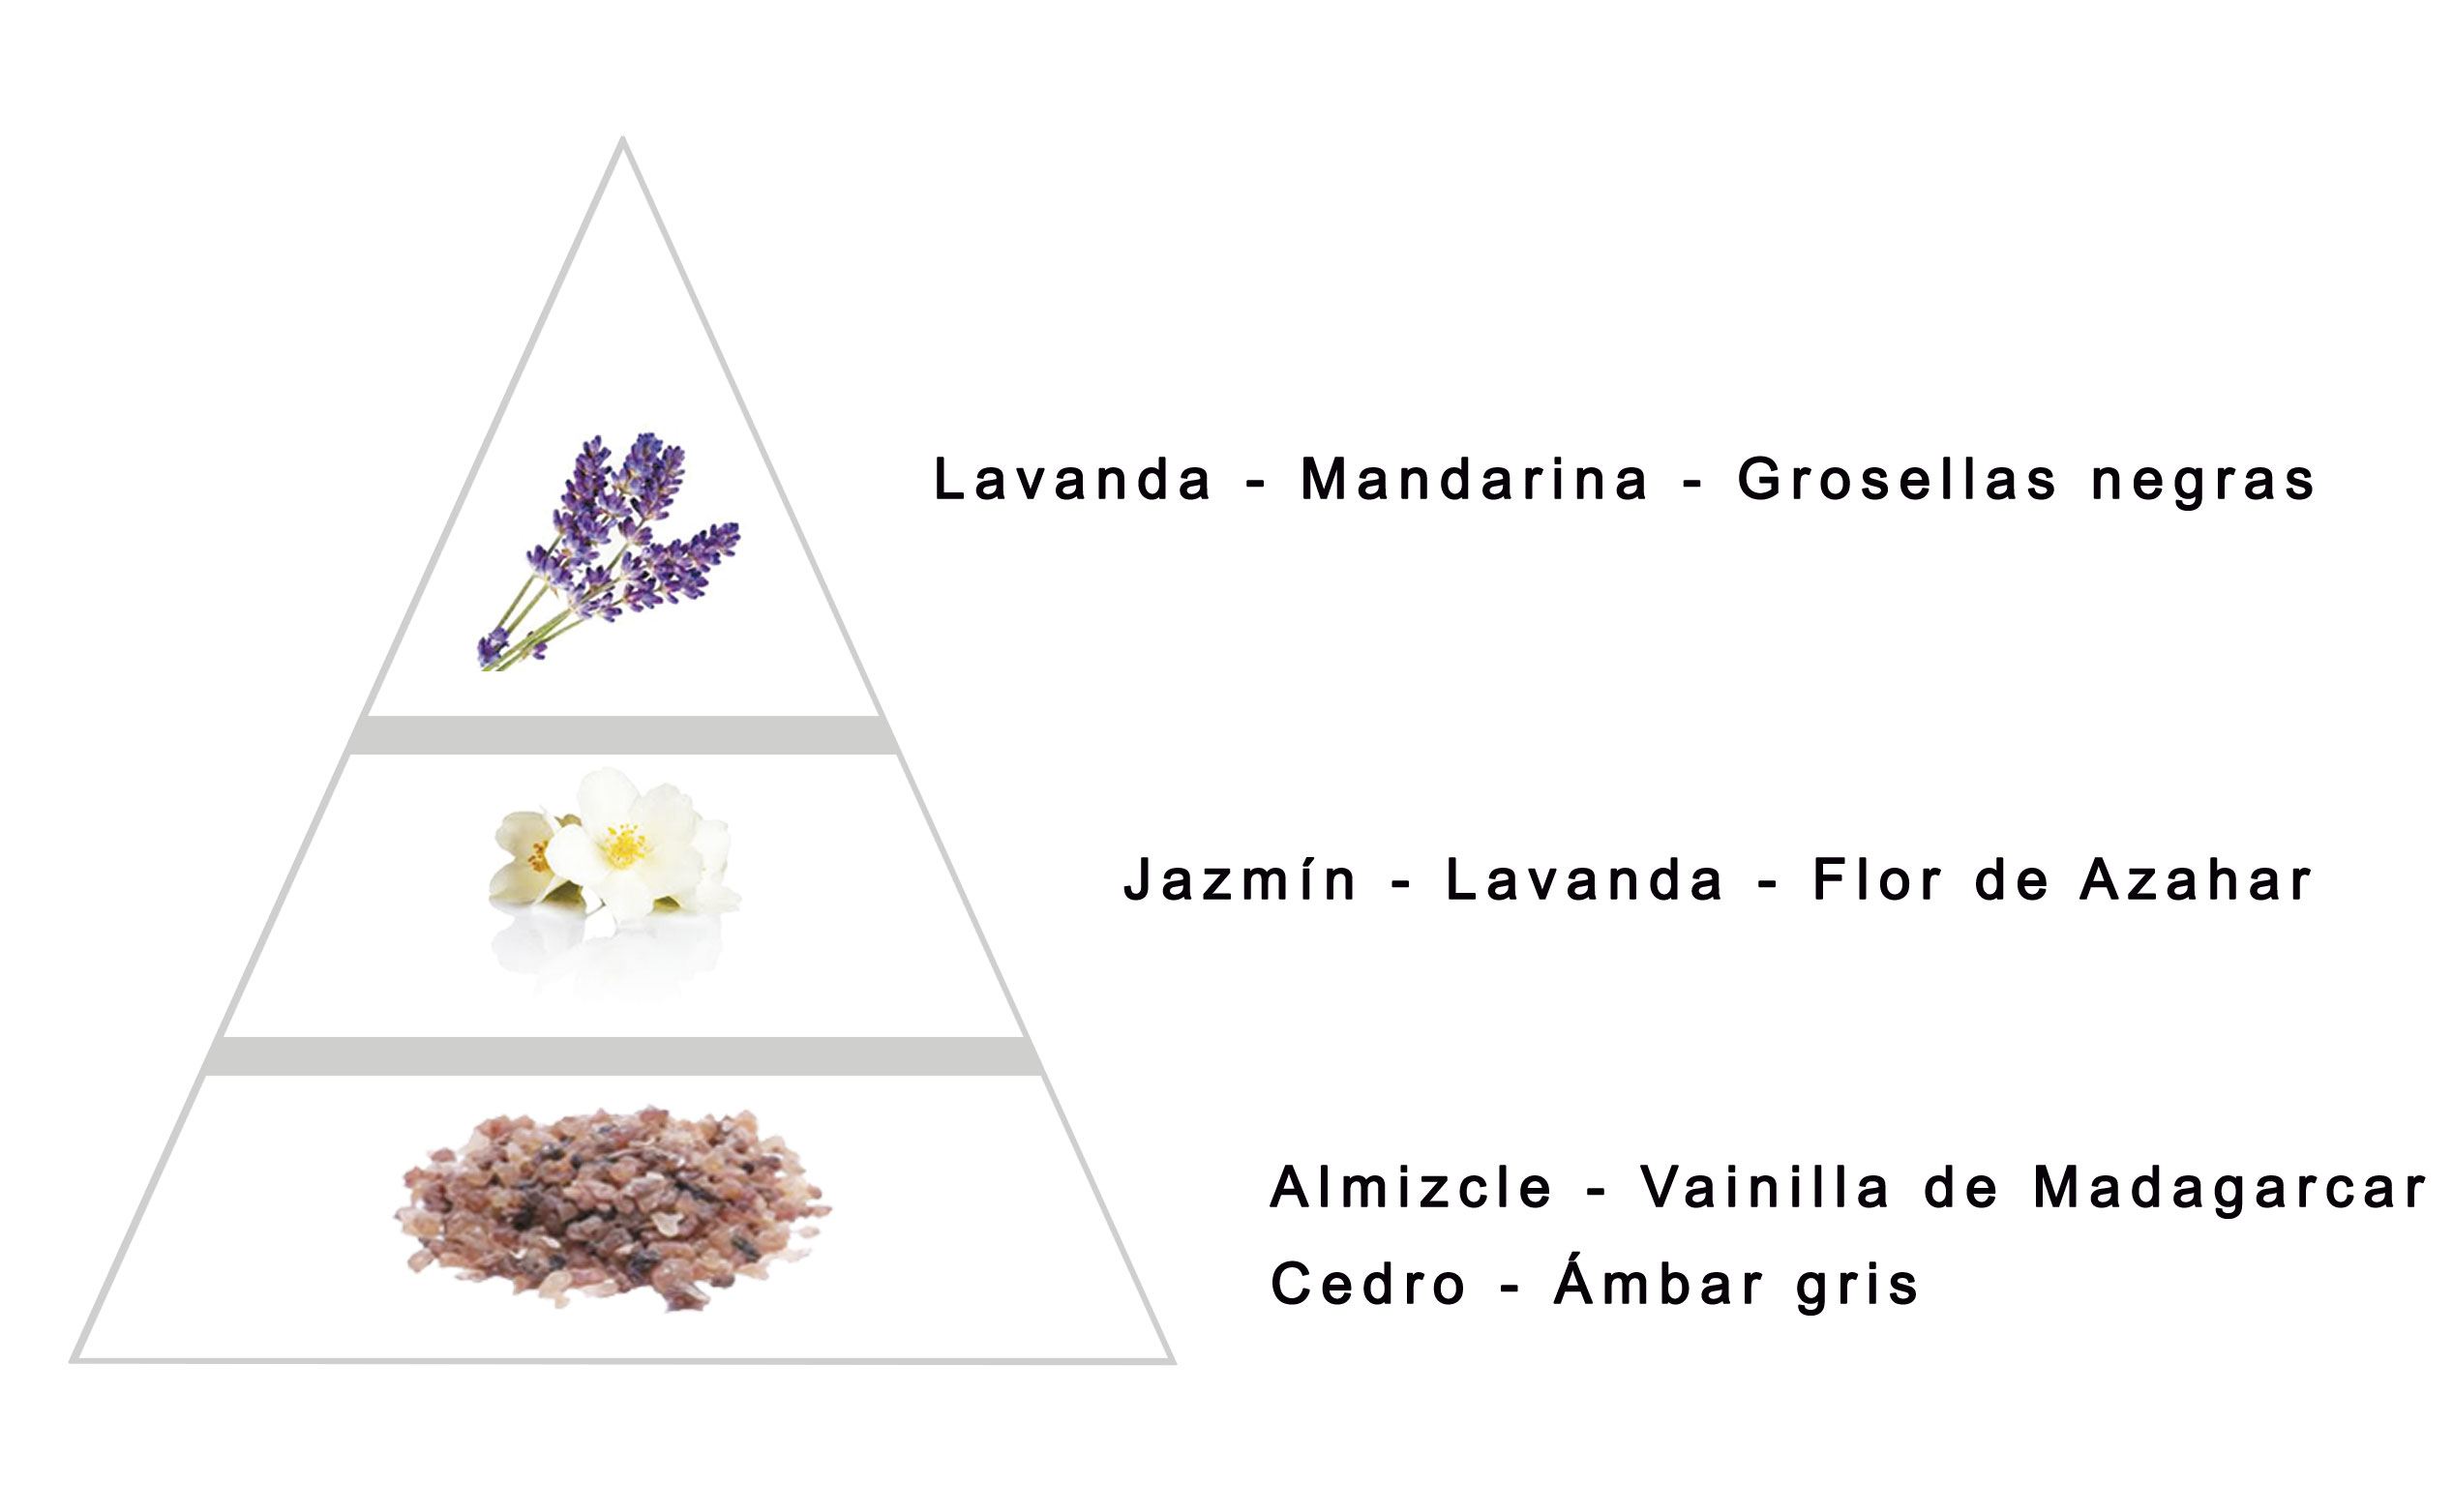 LIBERTY by LAROME (47F) Perfum Femení - Notes olfactives